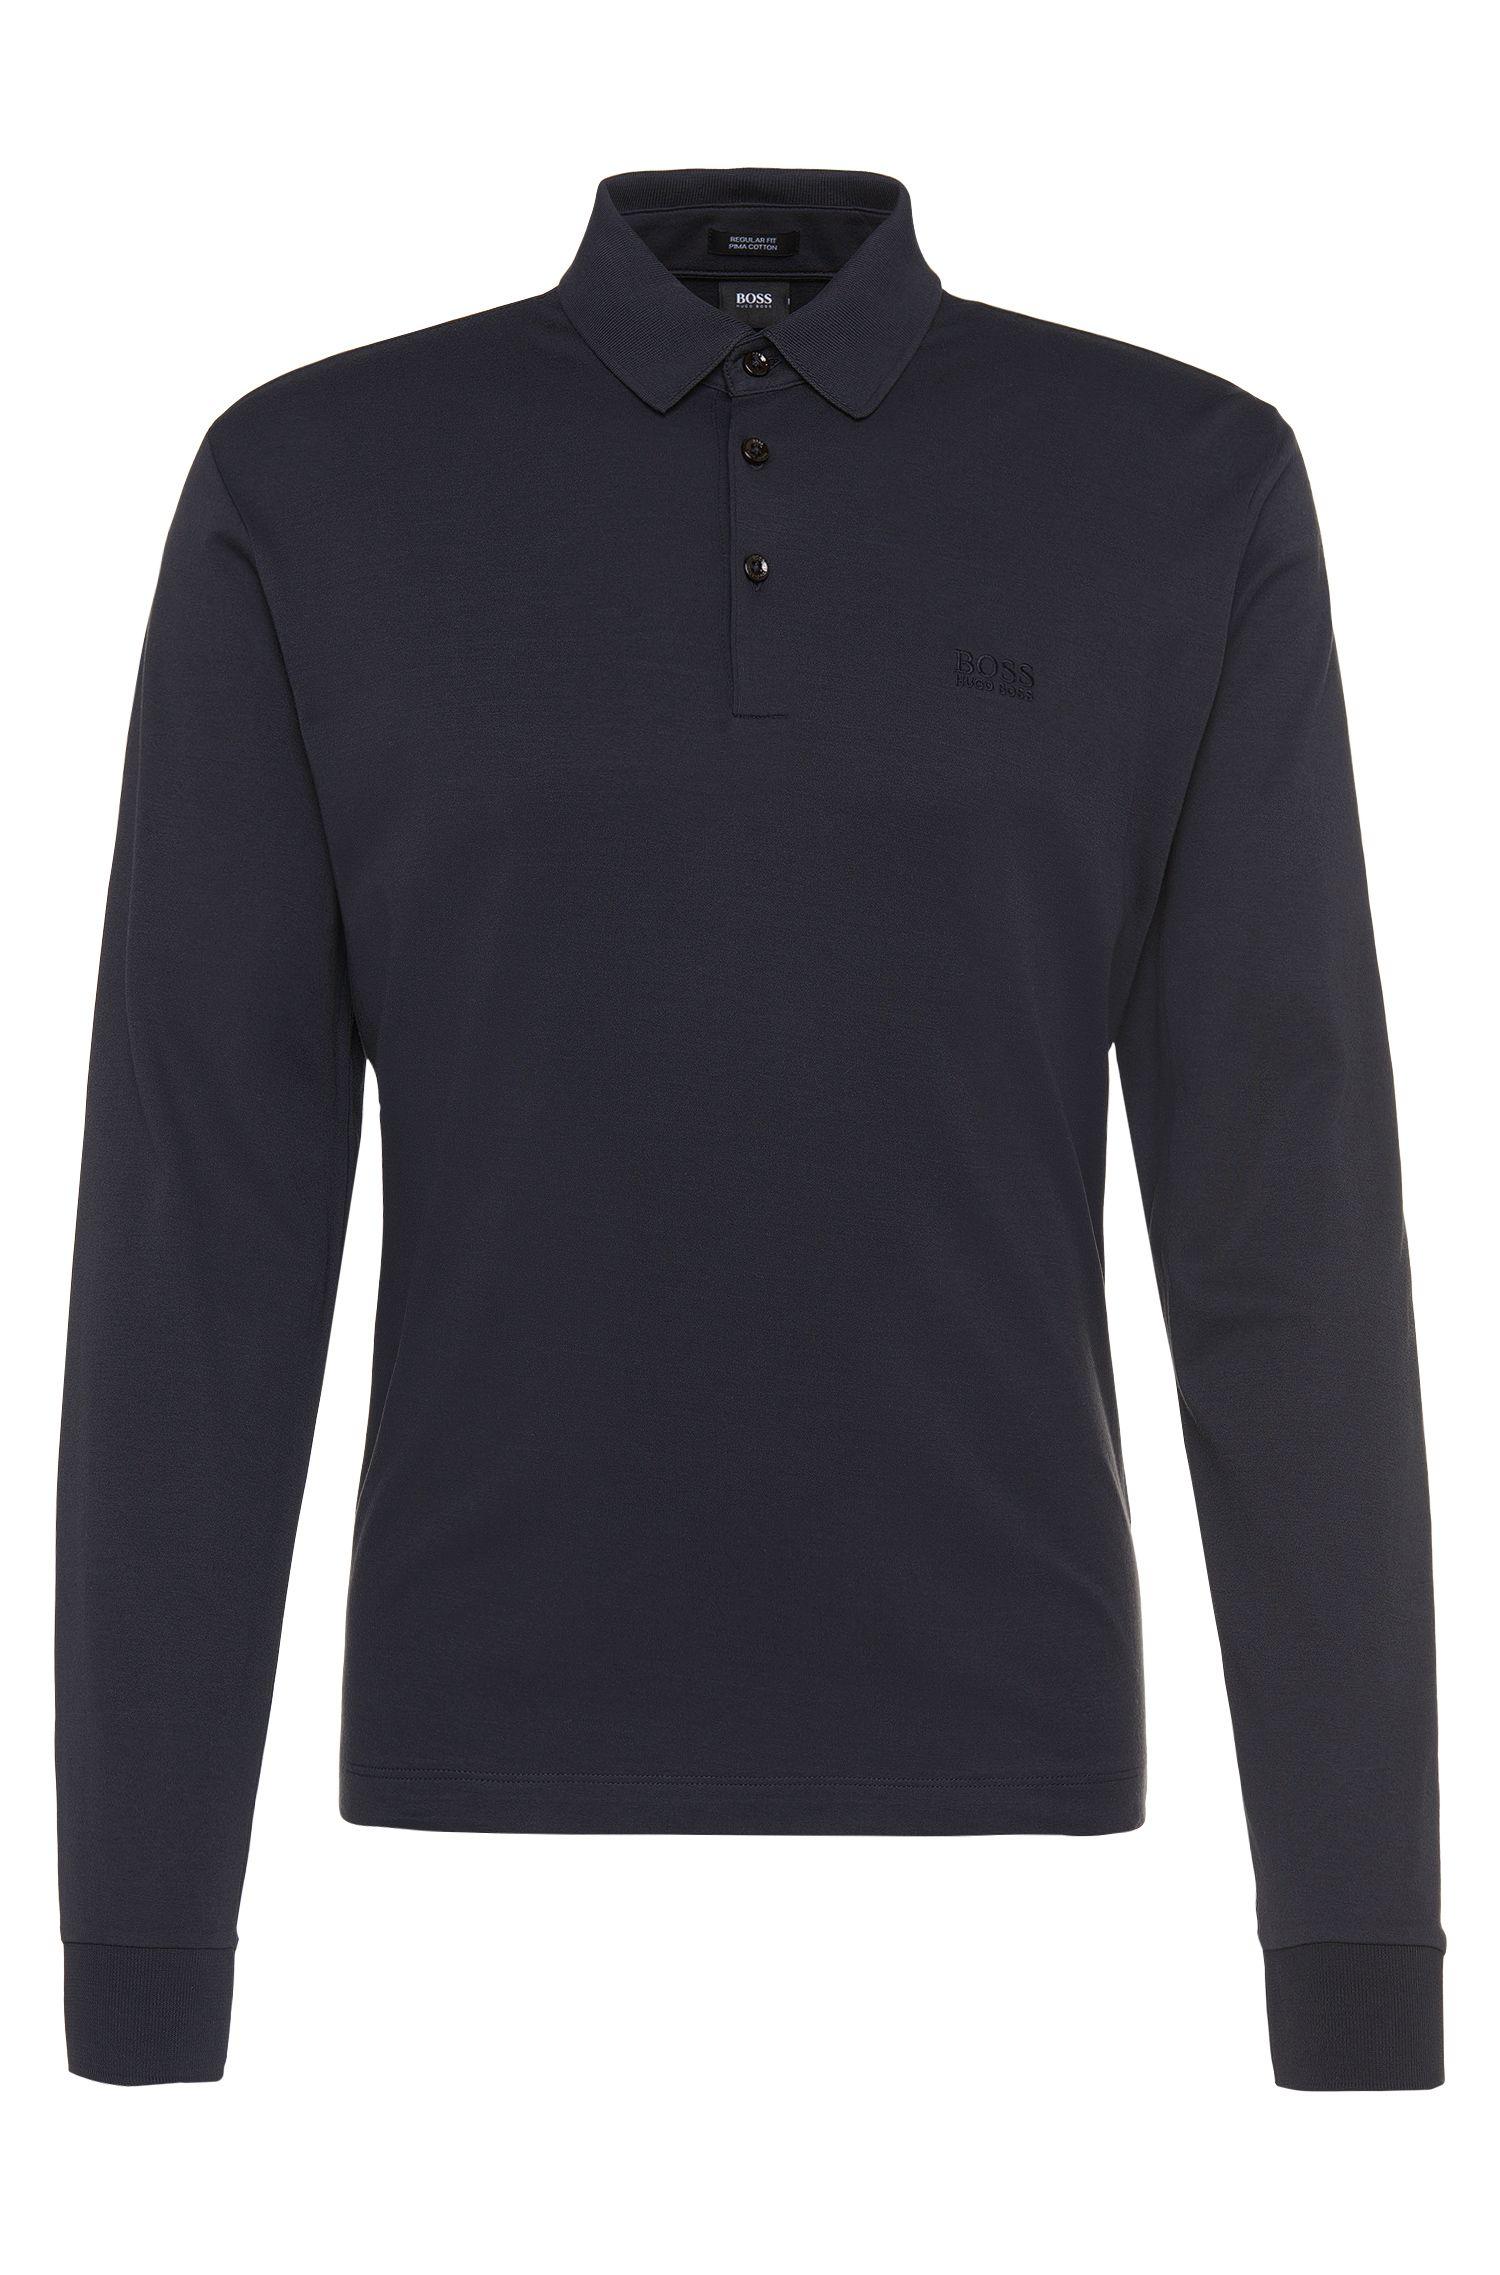 Regular-Fit Longsleeve-Poloshirt aus Pima-Baumwolle: 'Phillian'